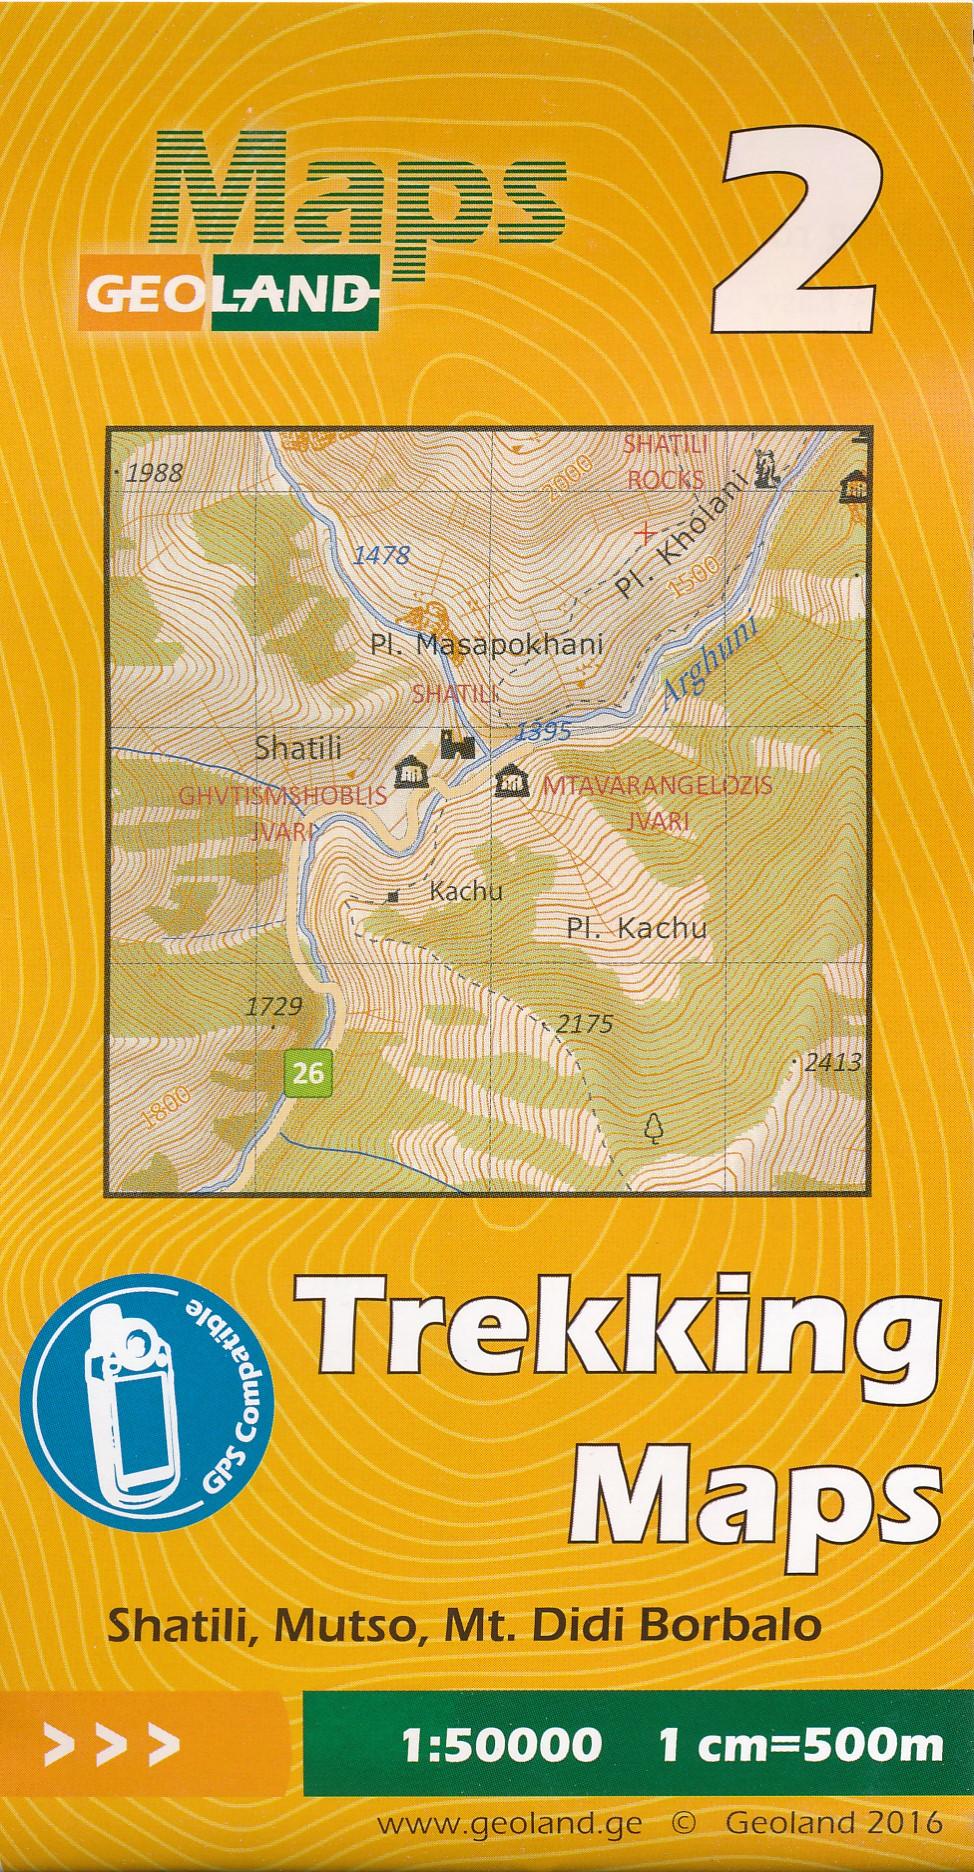 Wandelkaart - Topografische kaart 02 Shatili - Mutso - Mt. Didi Borbalo | Geoland